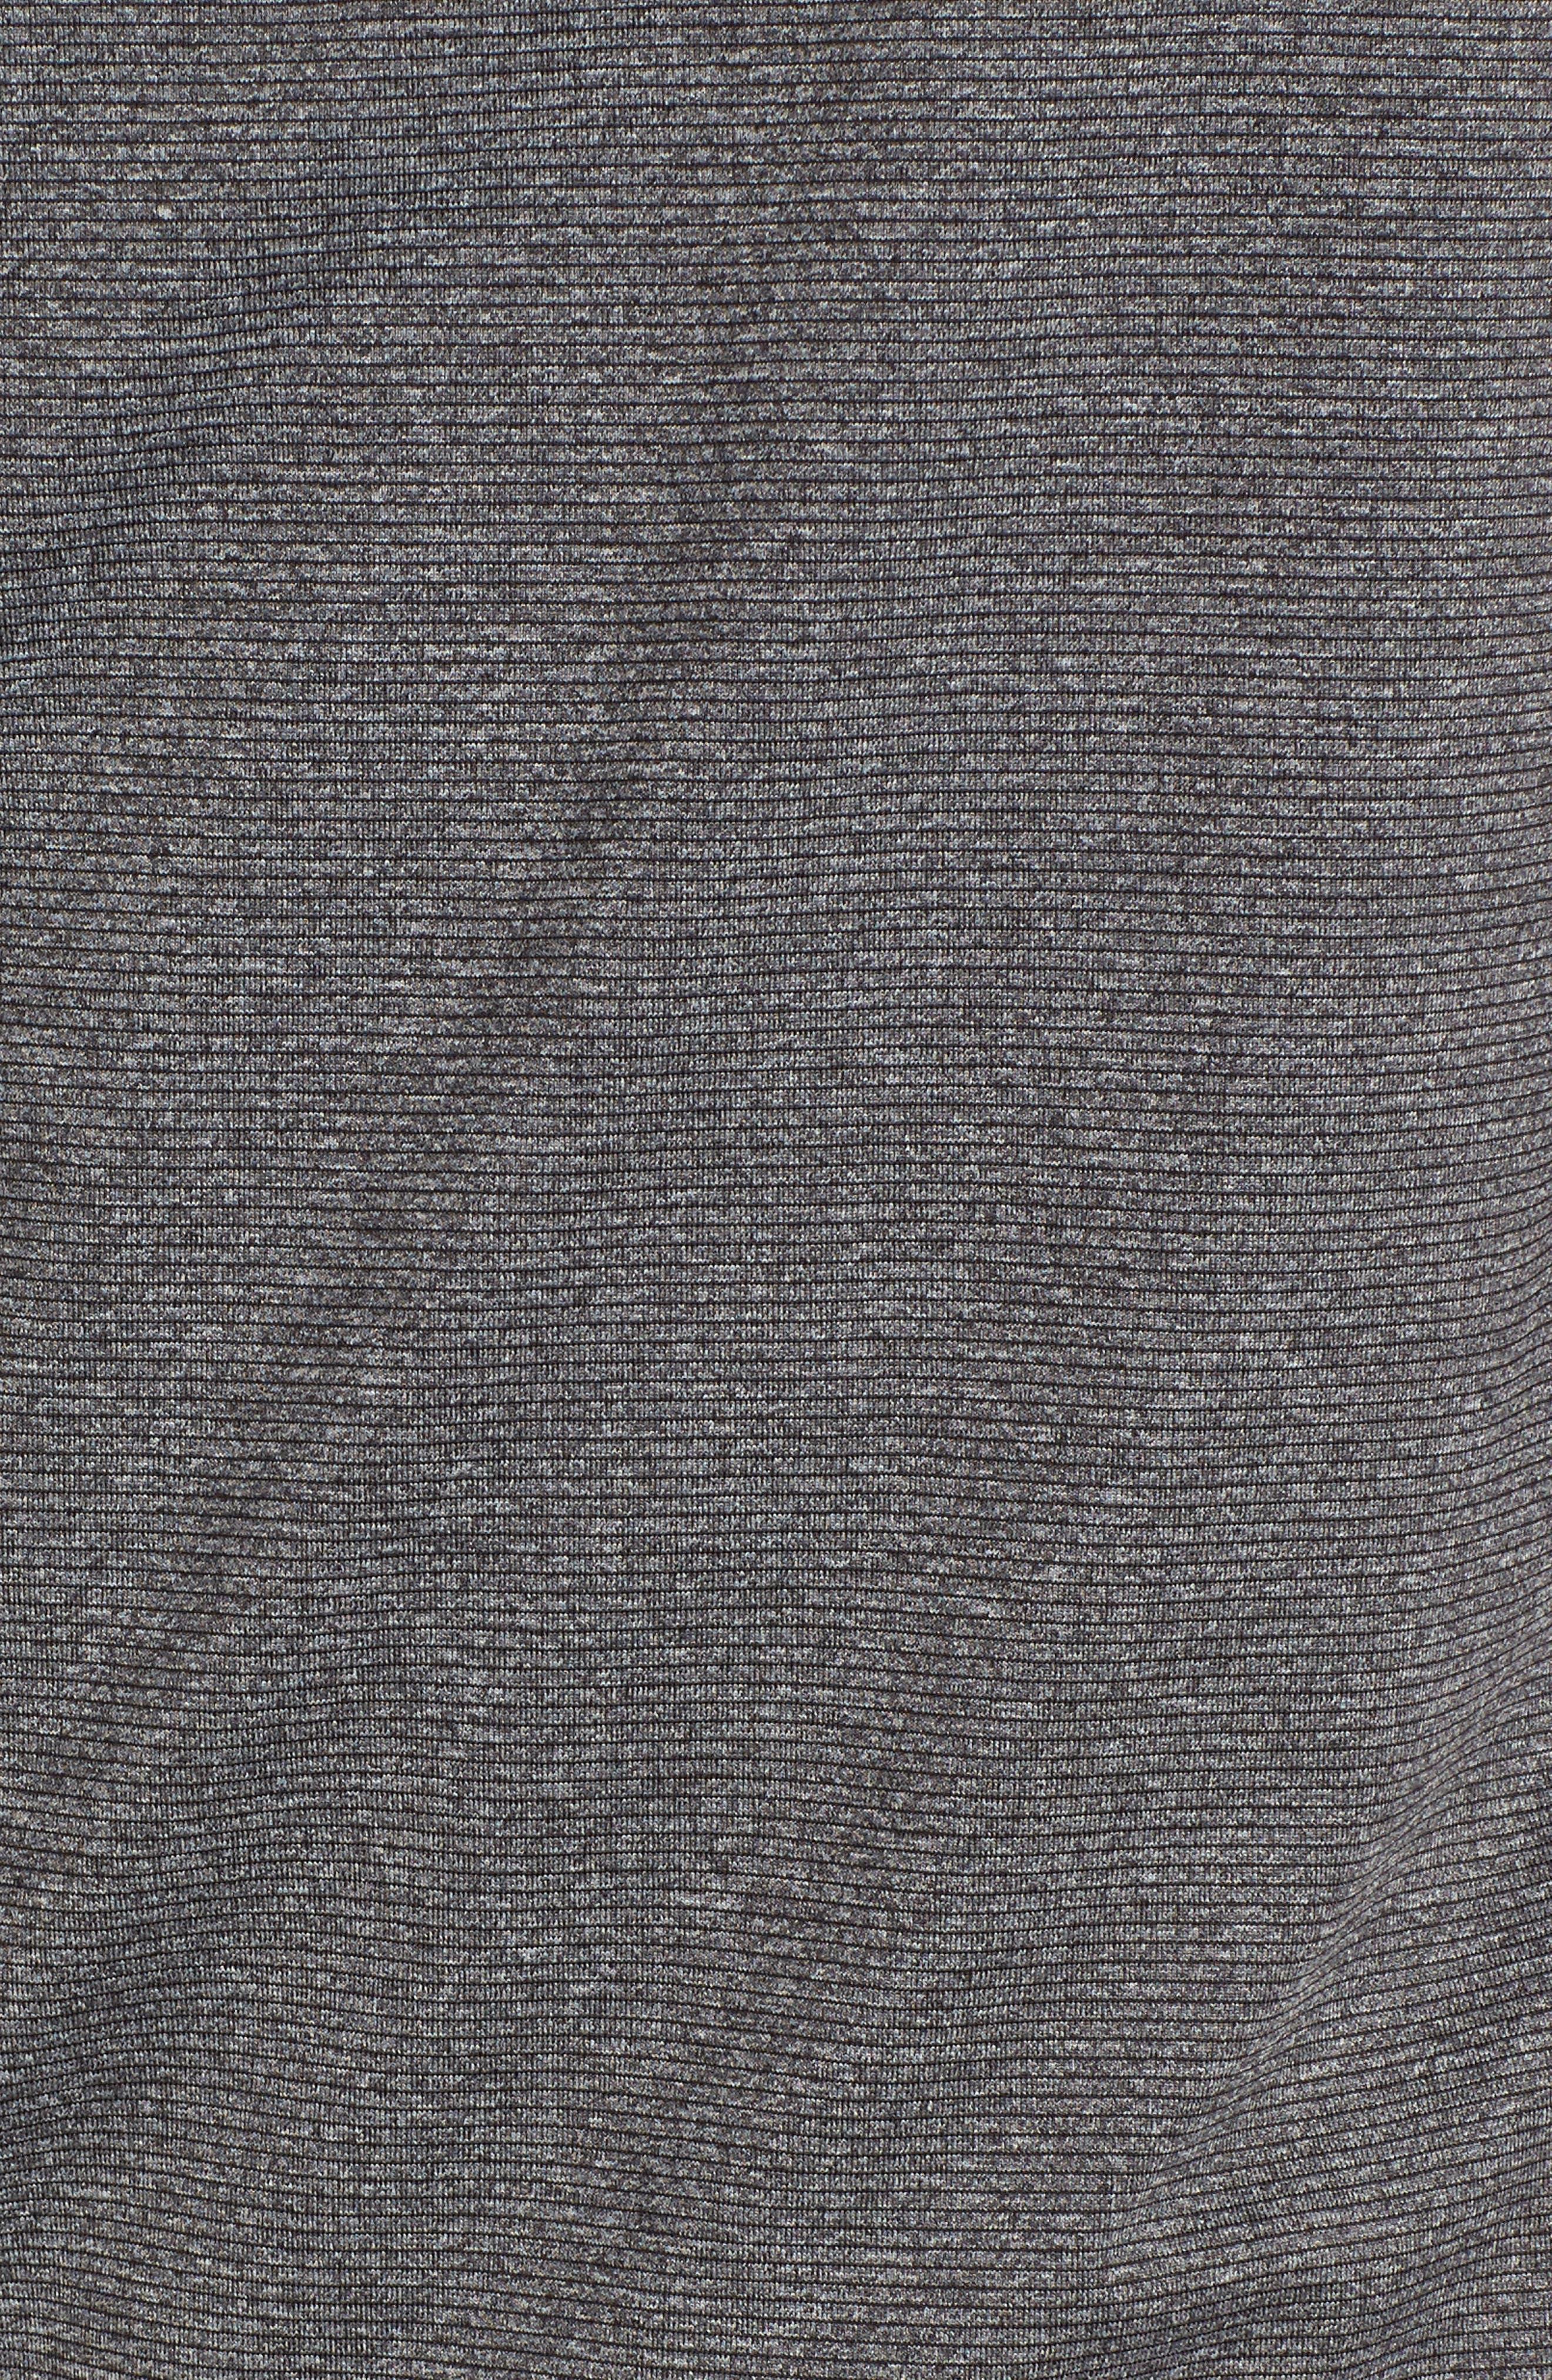 Shoreline - Oakland Raiders Half Zip Pullover,                             Alternate thumbnail 5, color,                             Charcoal Heather